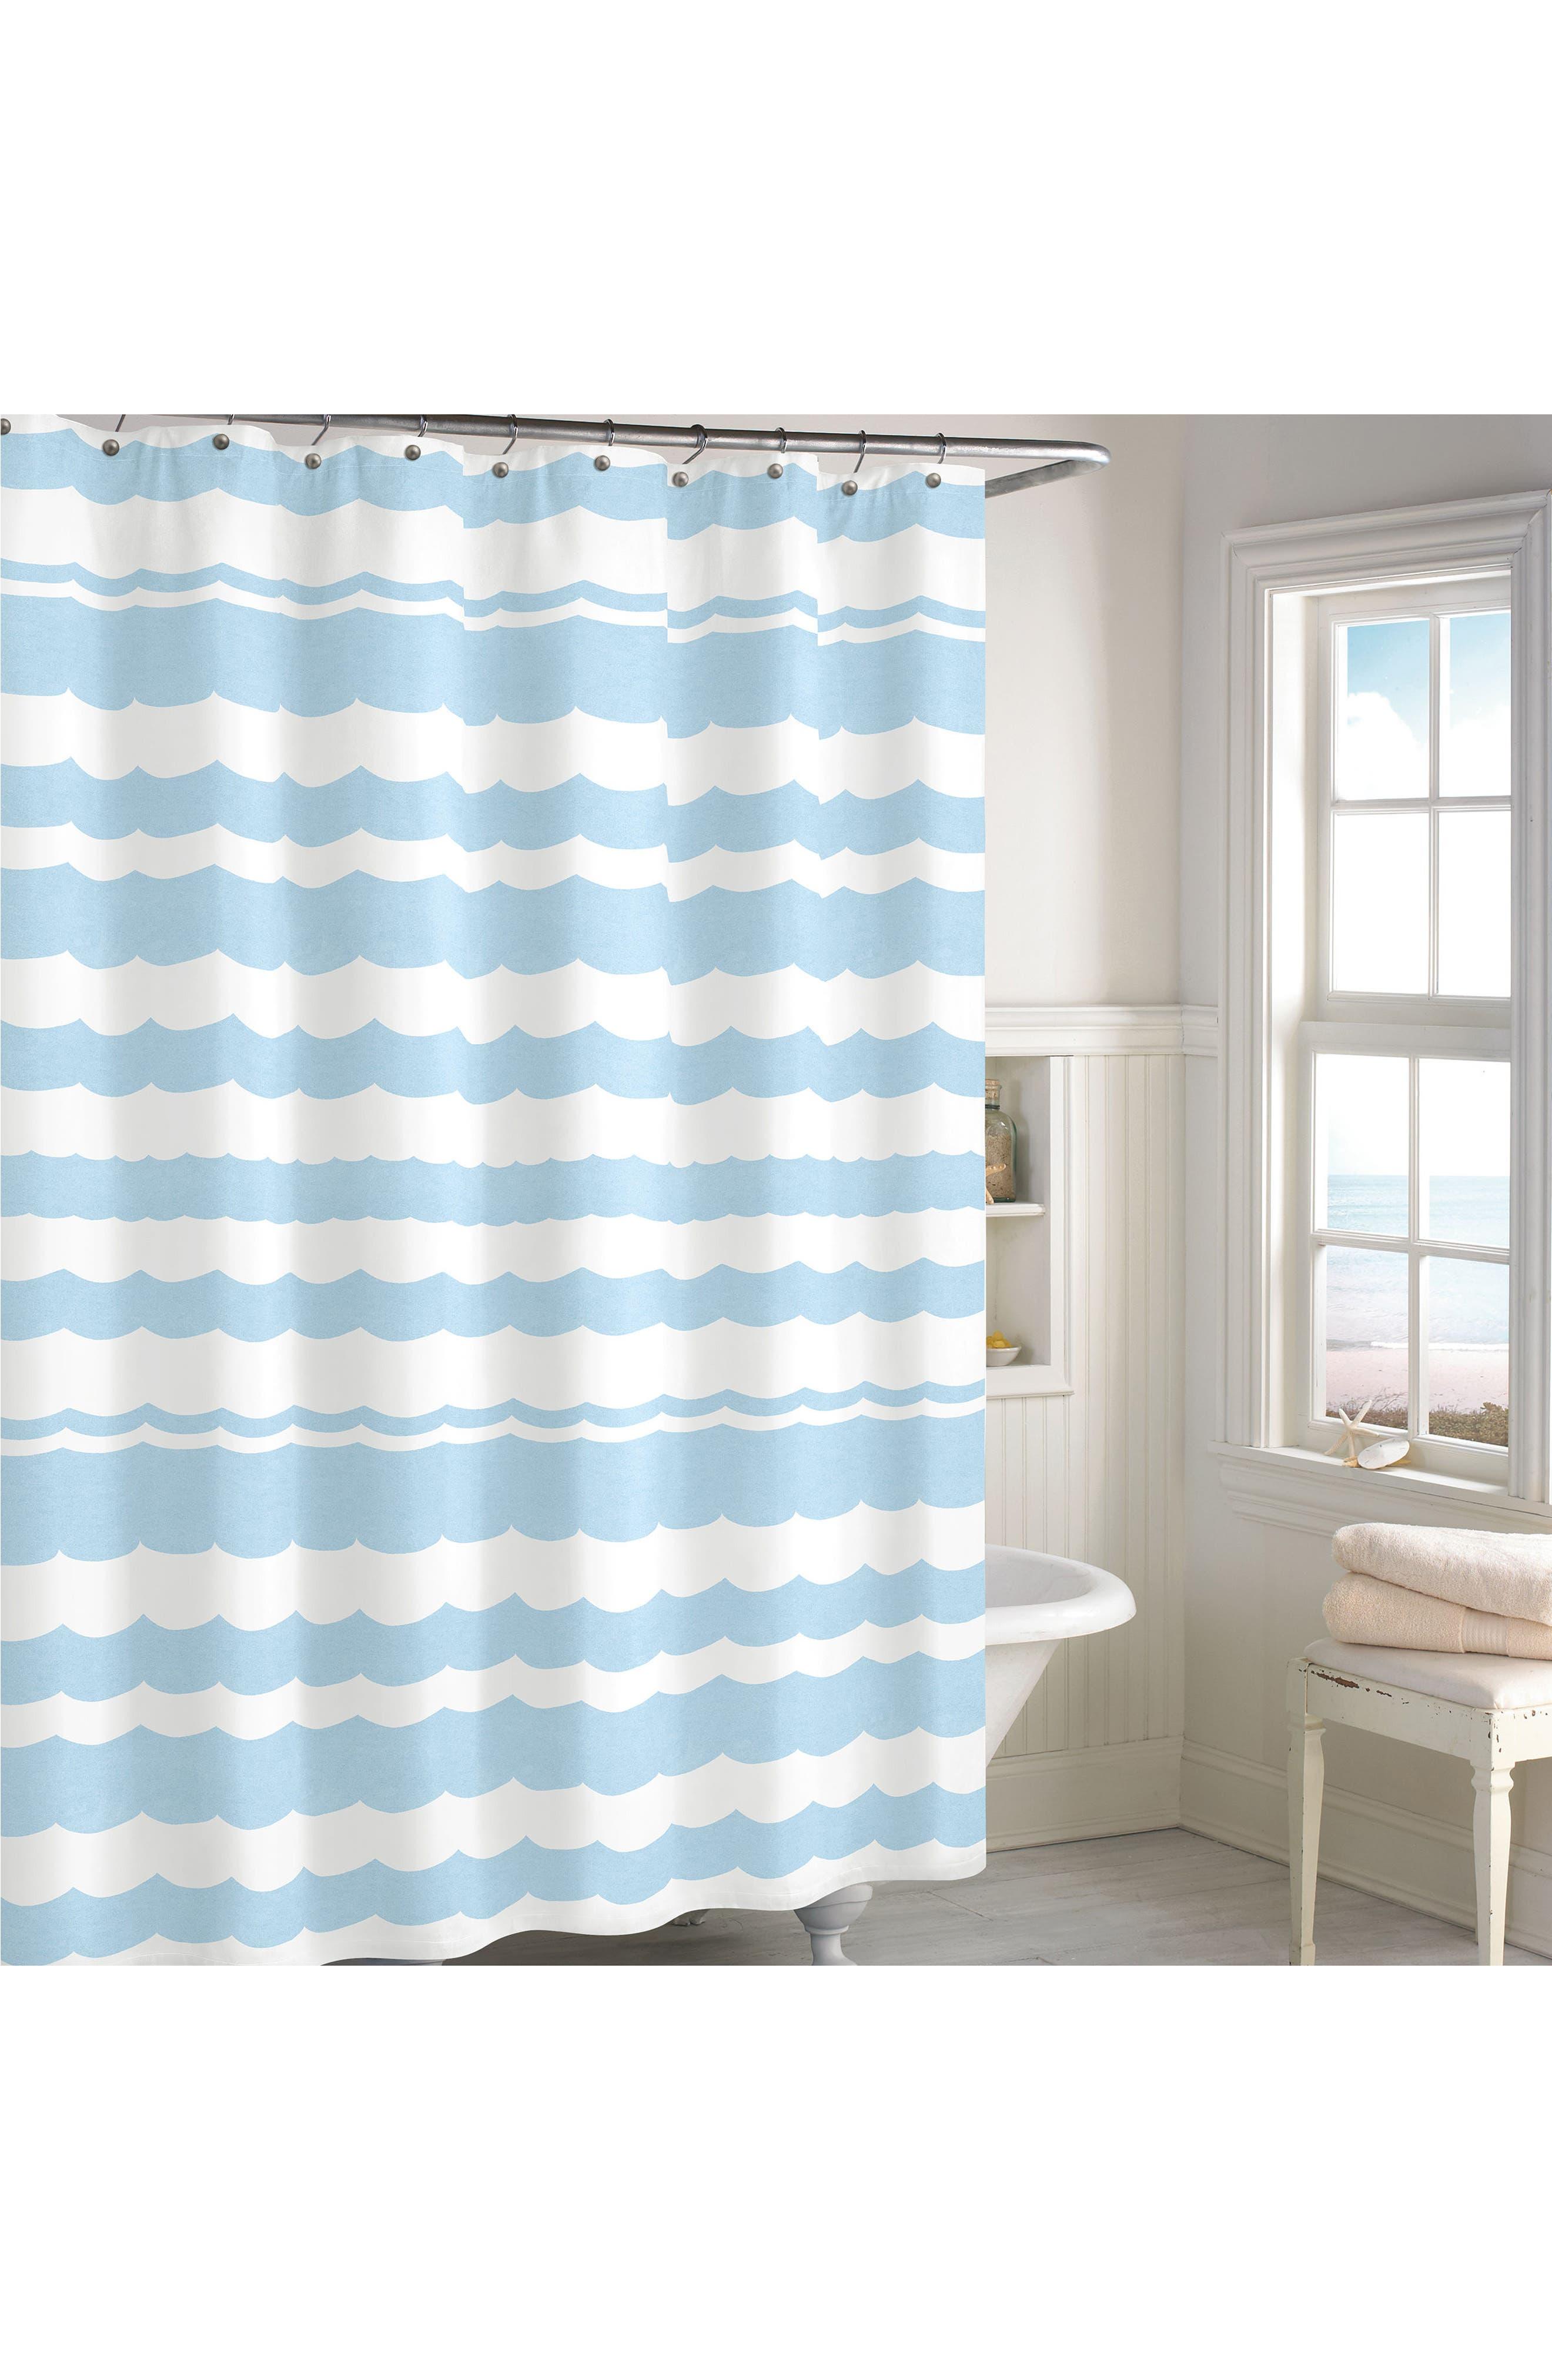 Wave Scallop Shower Curtain,                         Main,                         color, Blue